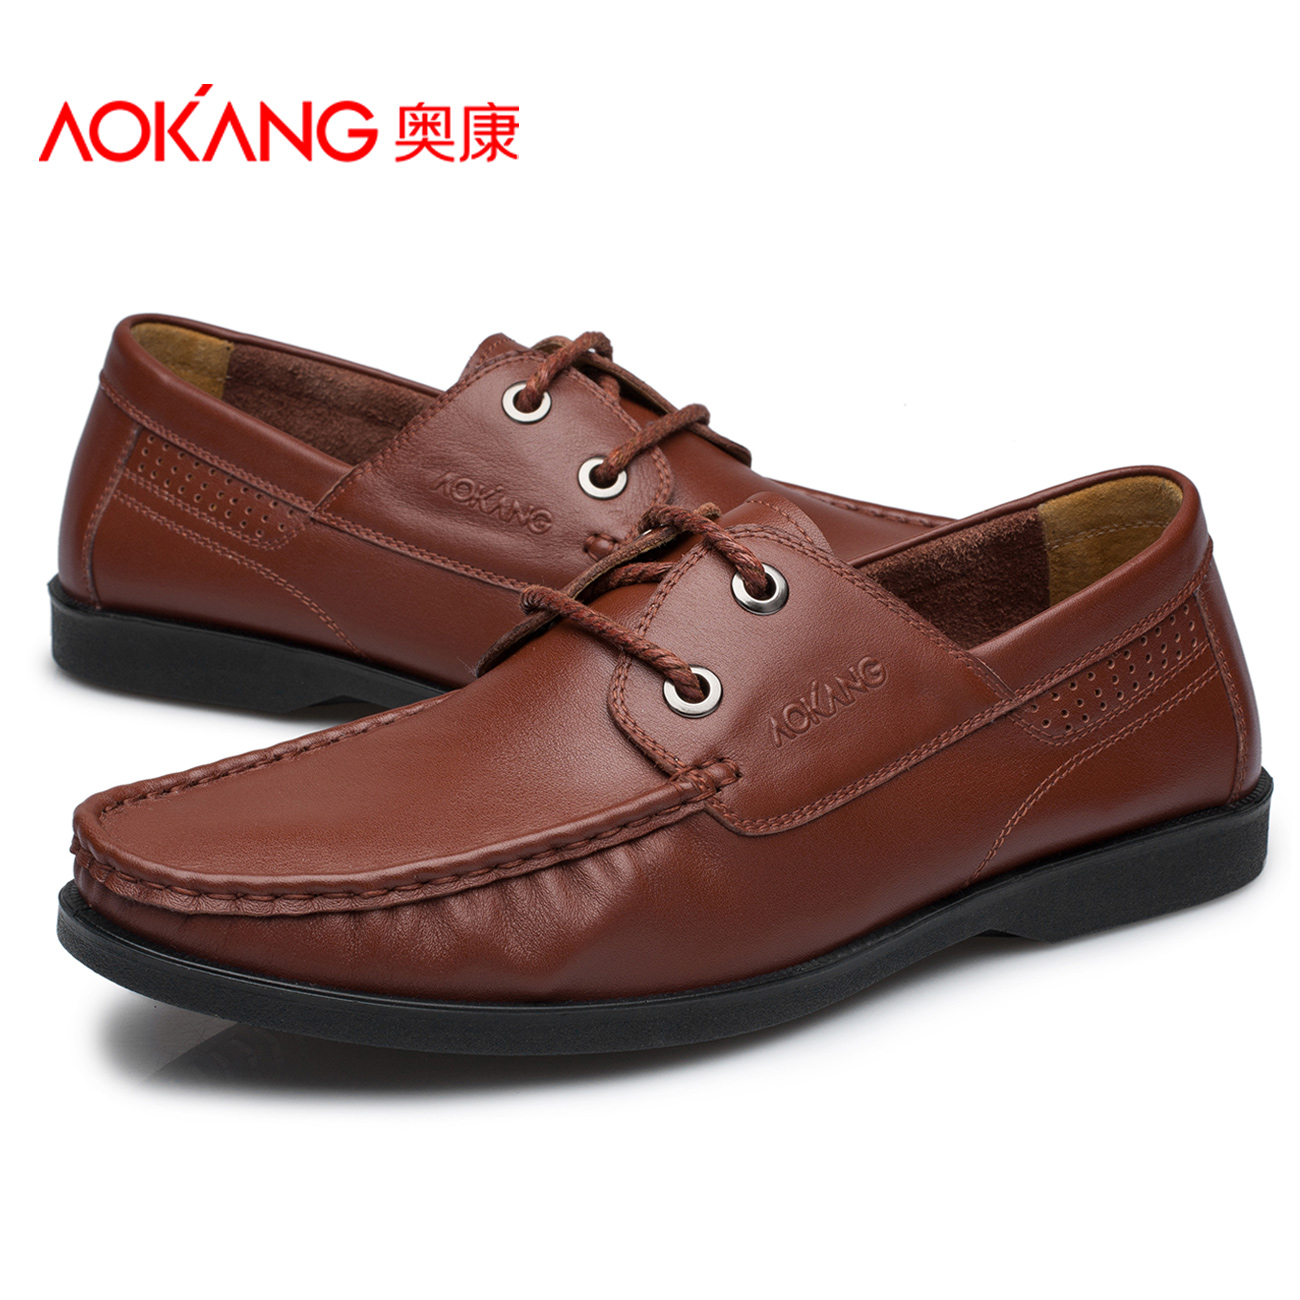 Демисезонные ботинки Aokang 143012006